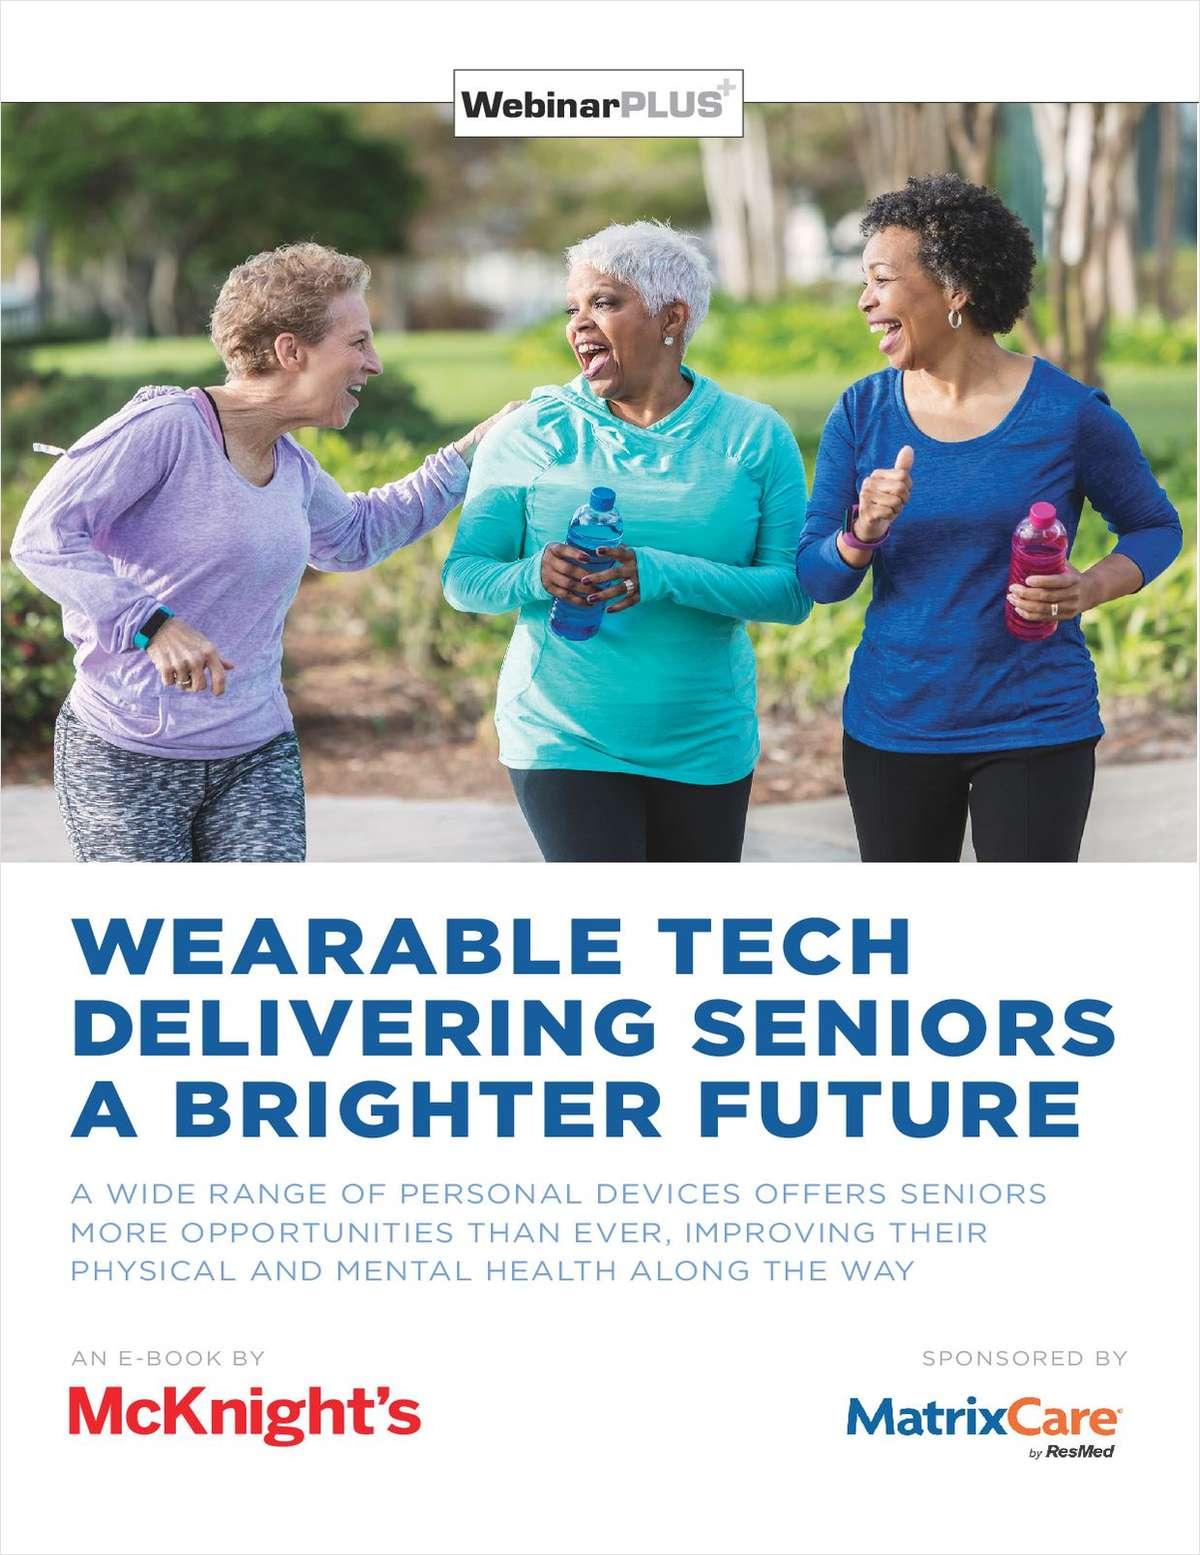 Wearable Tech Delivering Seniors a Brighter Future